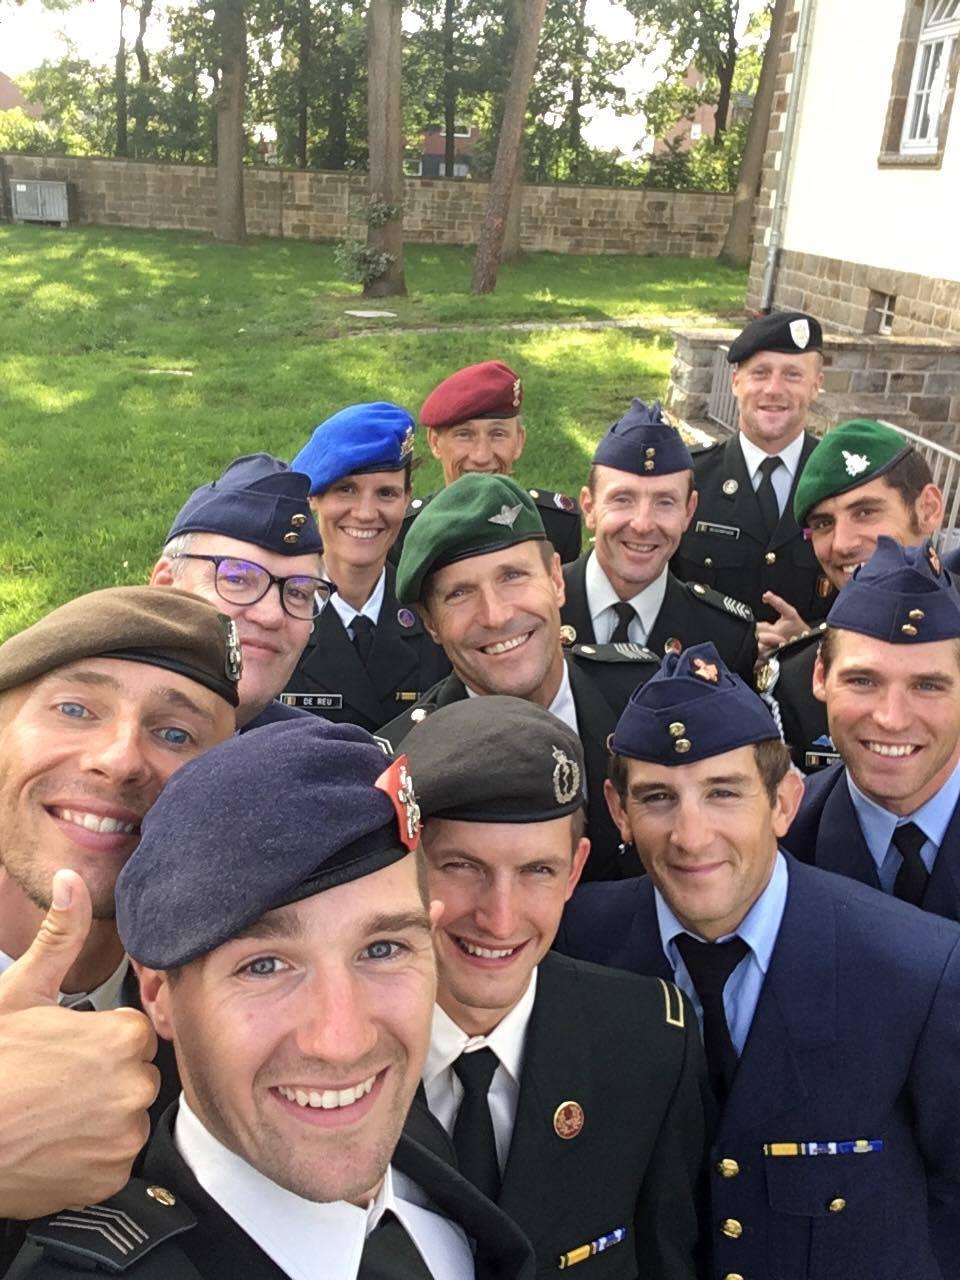 Belgian Military team dress 2017